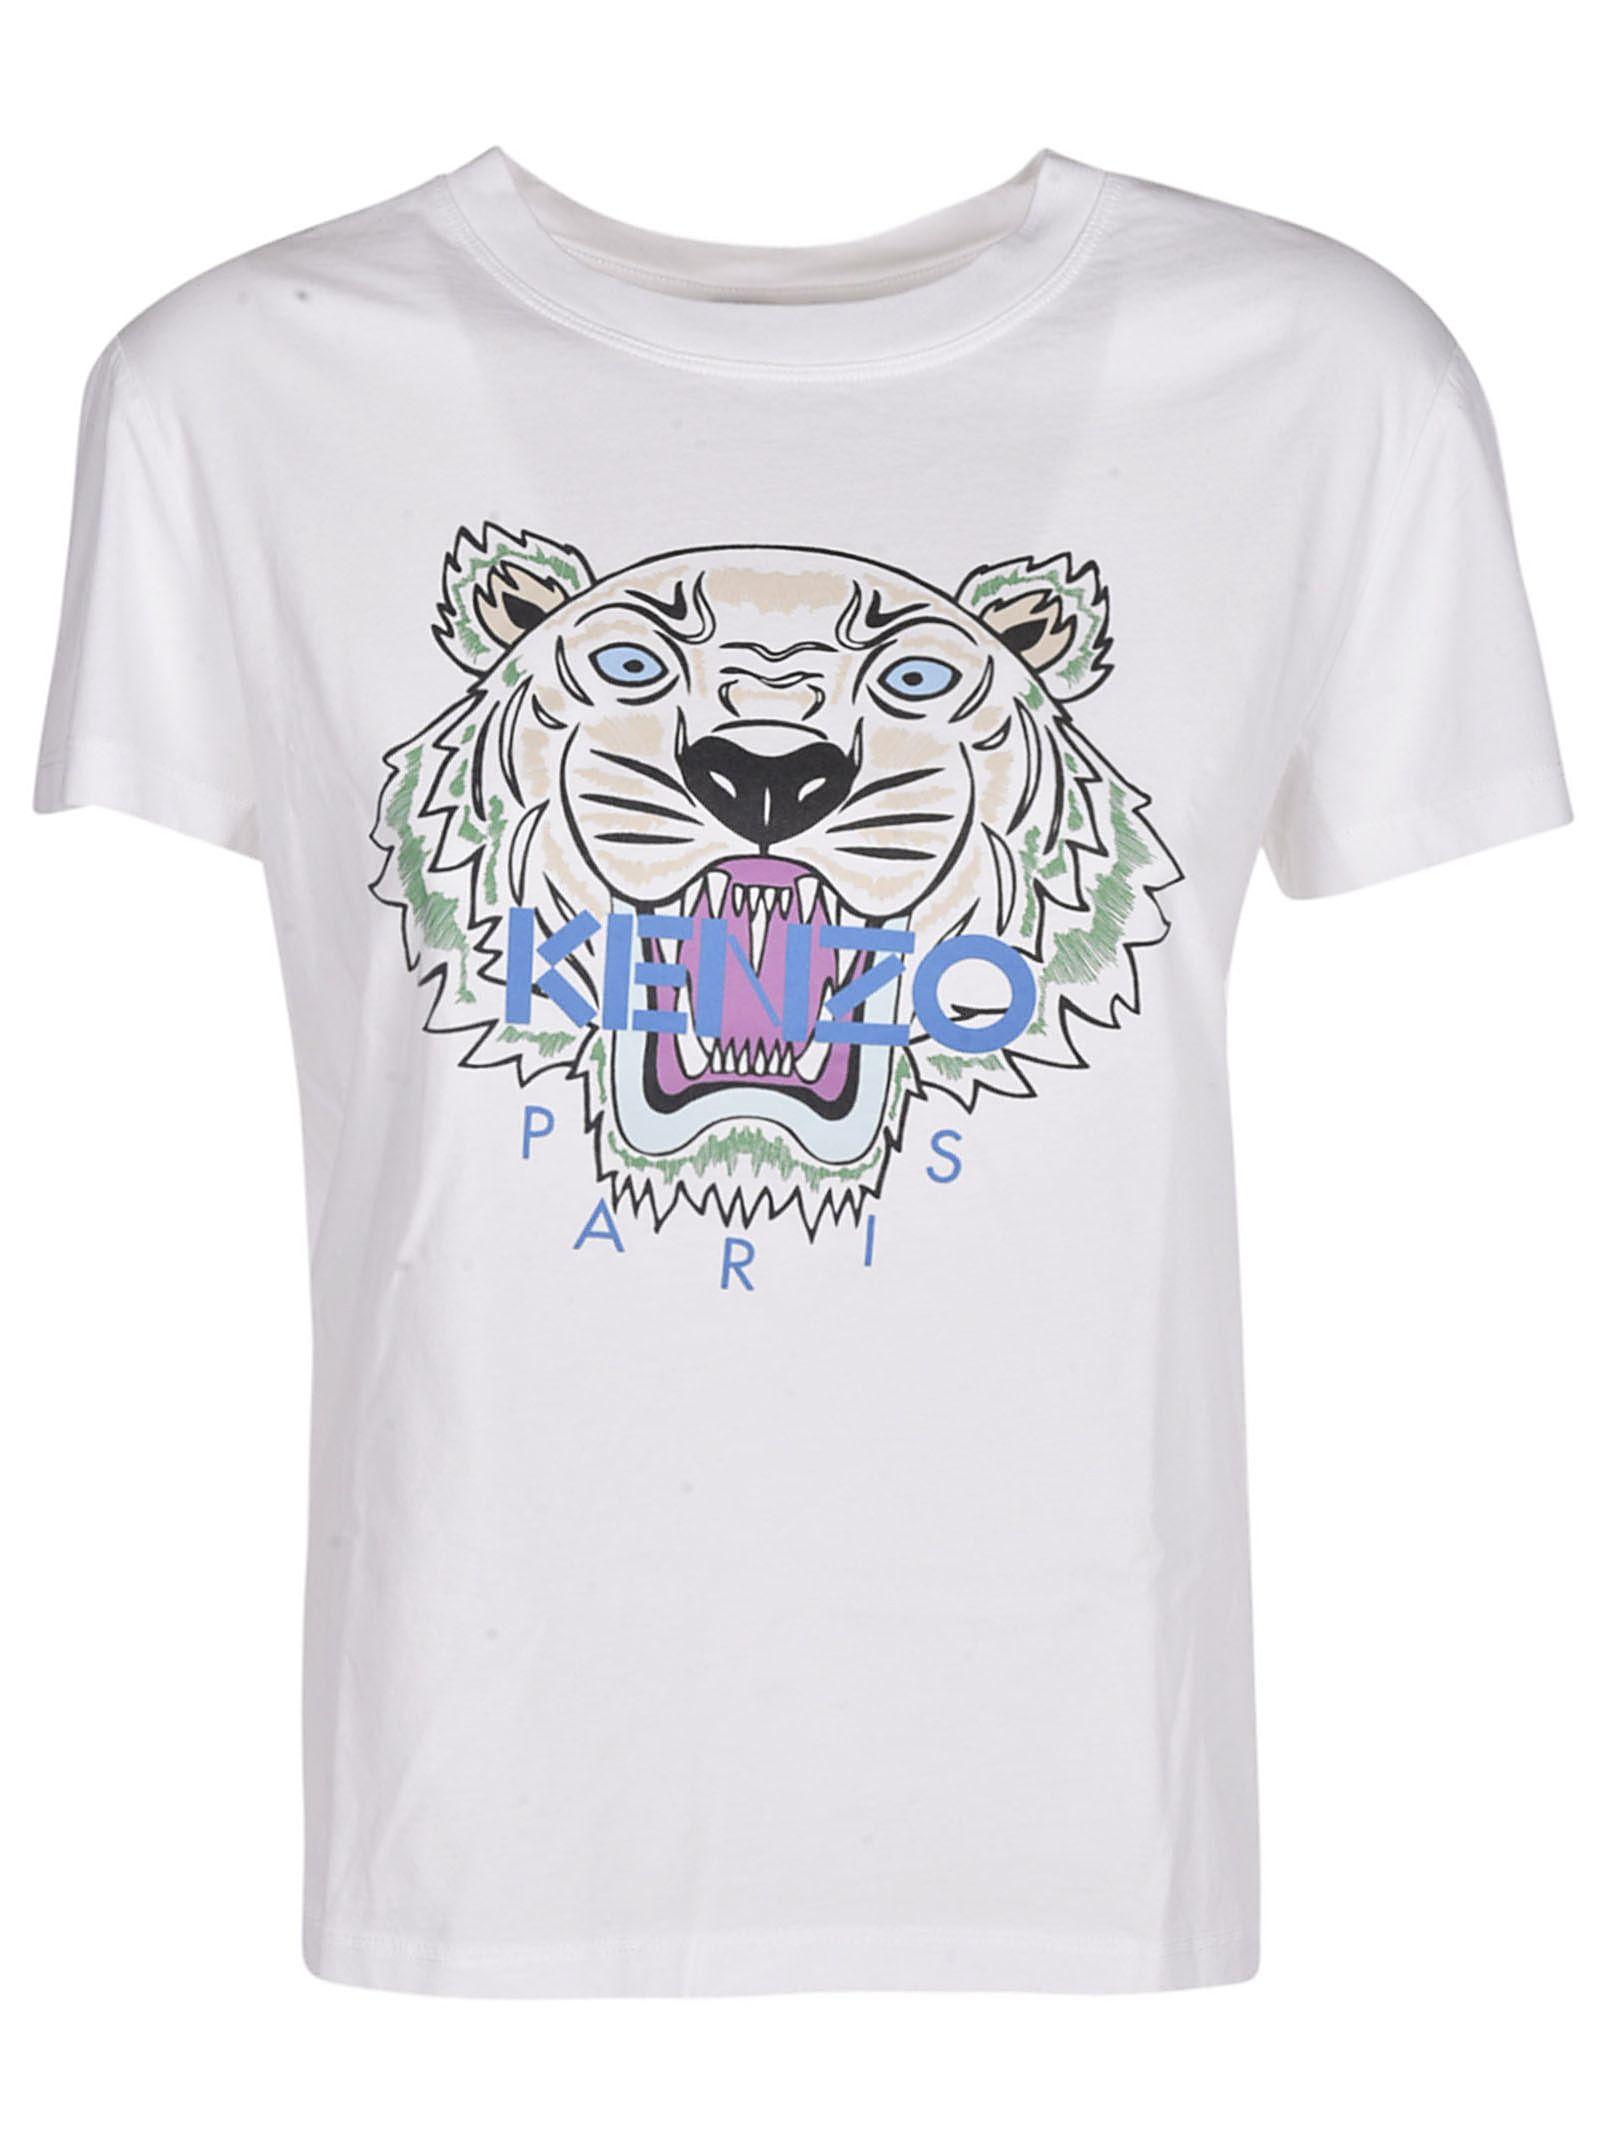 ... Shop Kenzo Tiger T Shirt In White KENZO TIGER T SHIRT Source · T Shirt  Kenzo pour Homme Shopsquare b88a7d70118